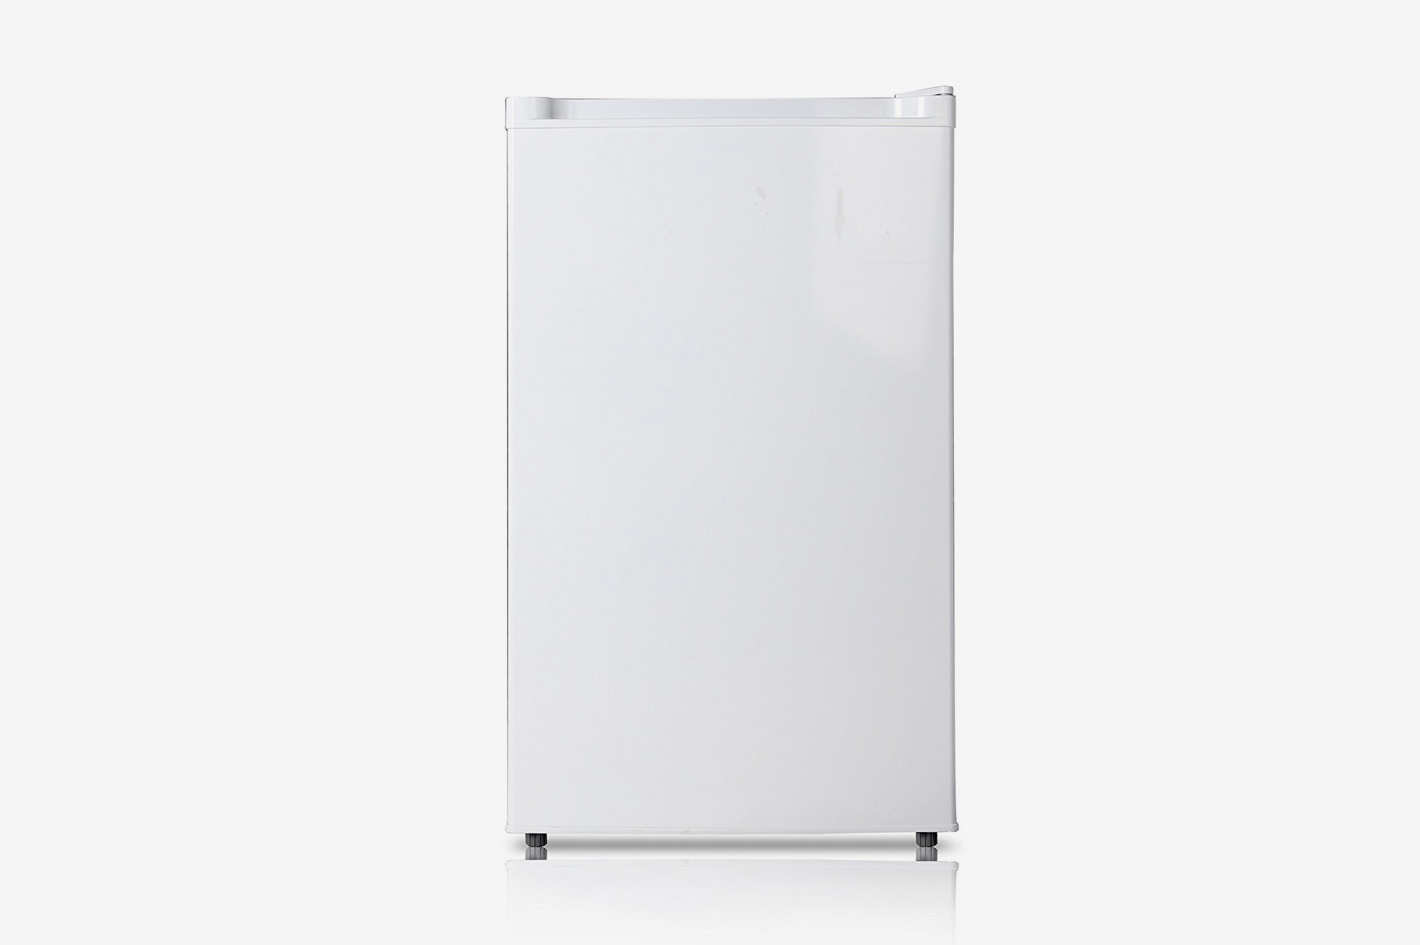 Midea 3.0 Cubic Fee Compact Single Reversible Door Upright Freezer